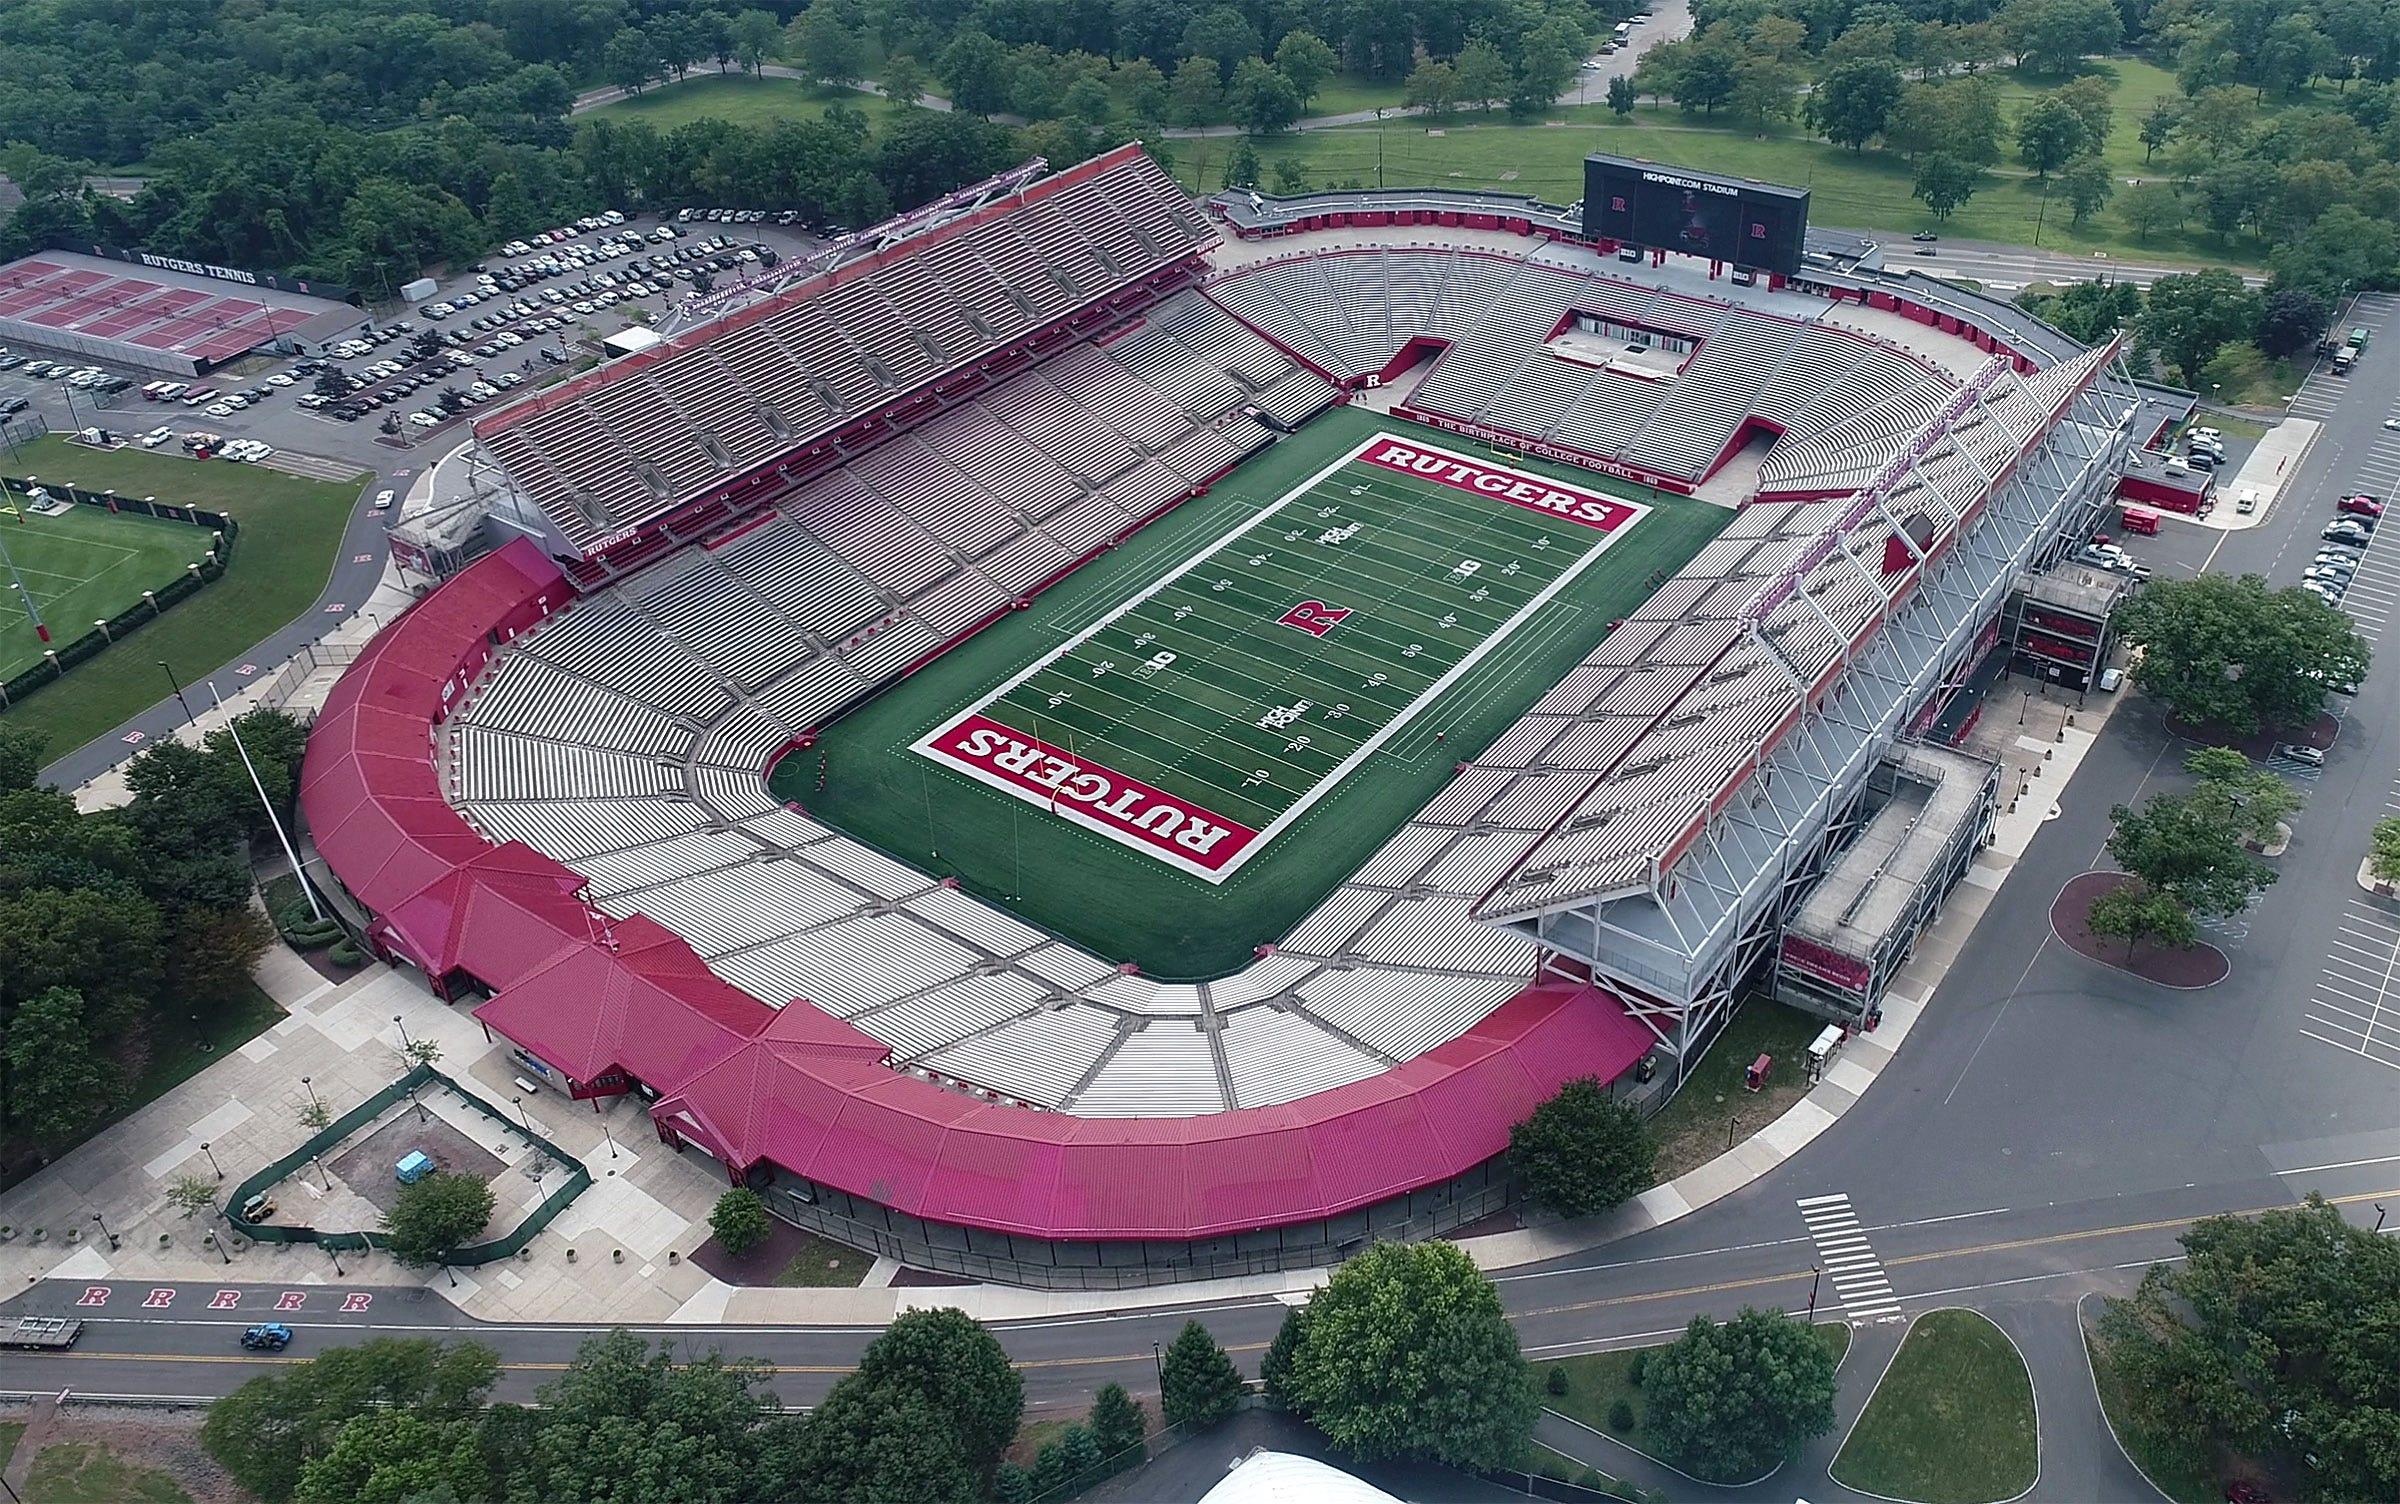 The Rutgers football stadium in Piscataway